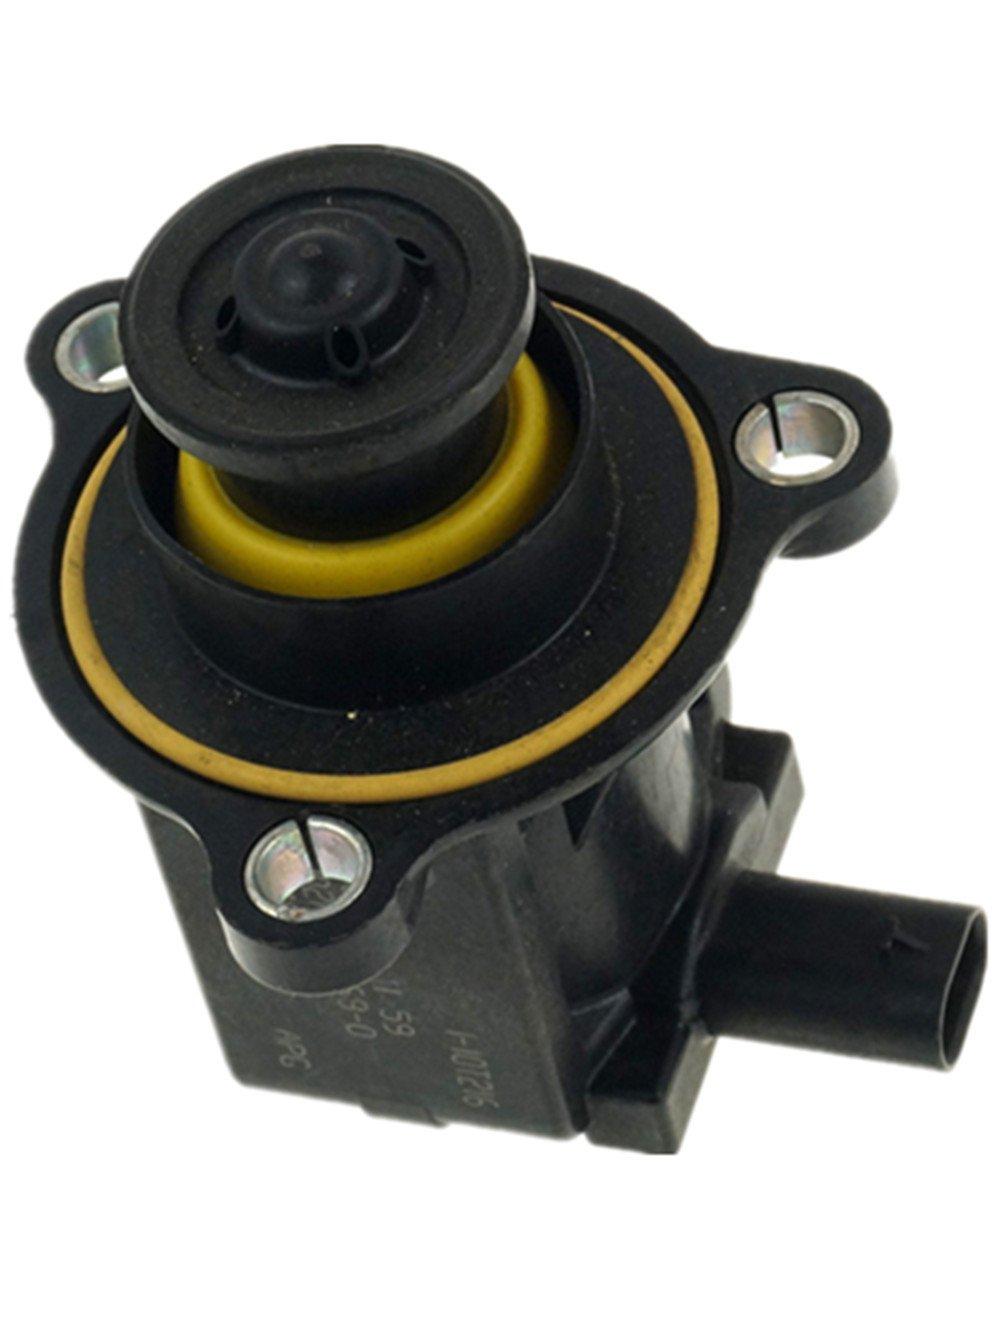 Yalai A0001531159 Turbo Cut-Off Diverter Valve